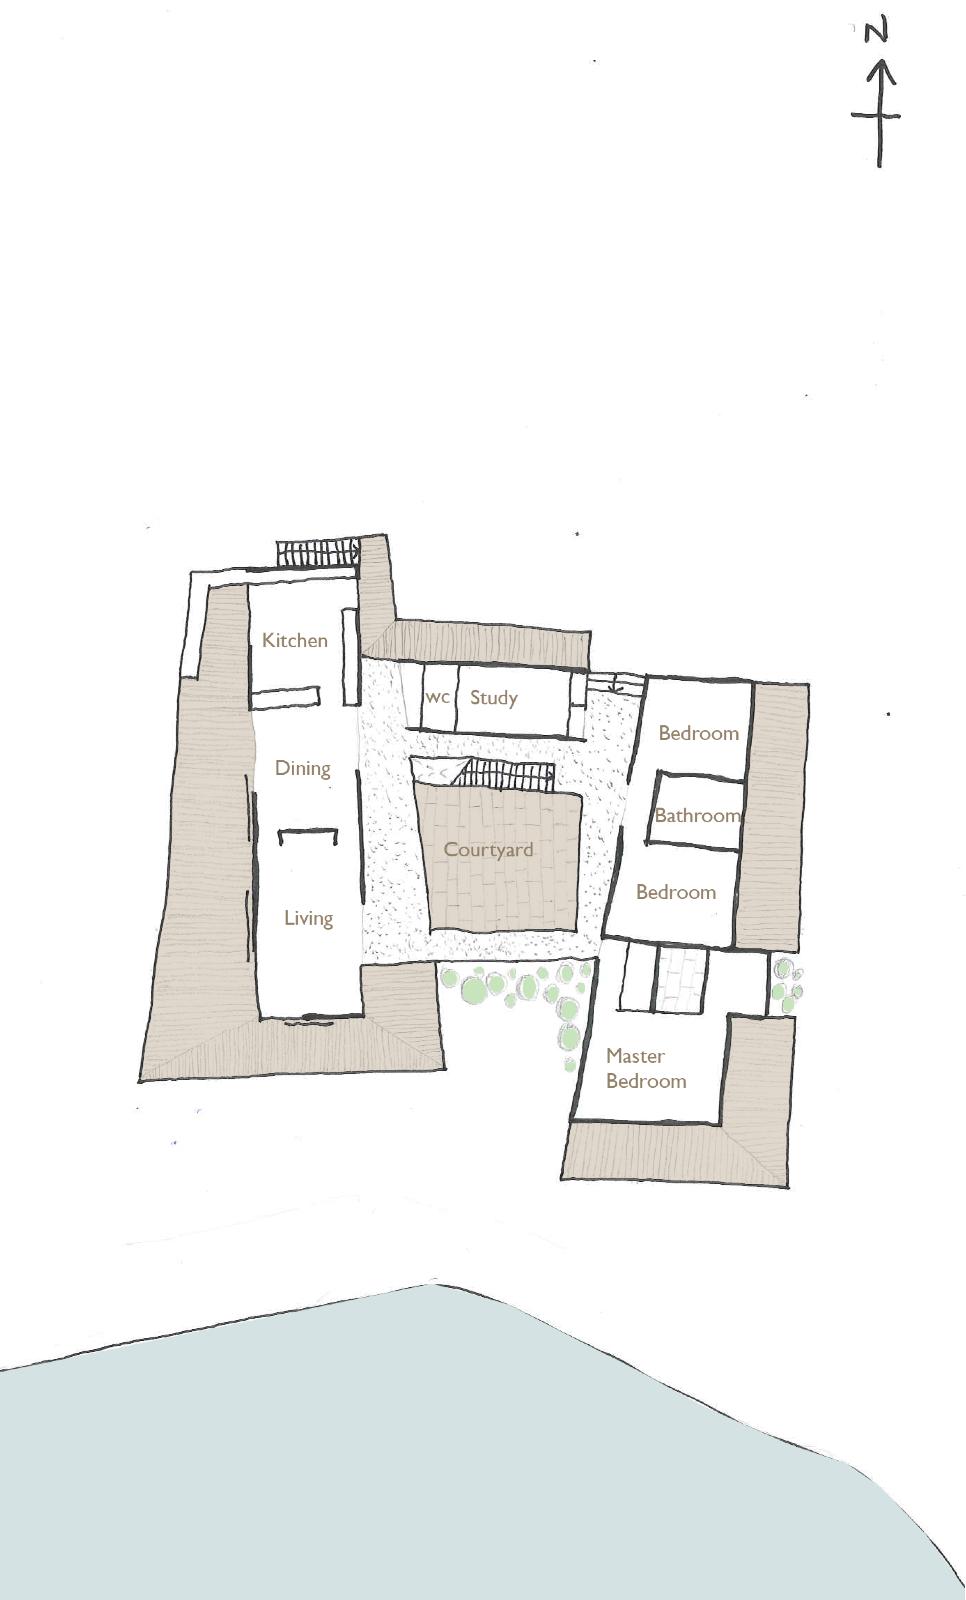 SWF Ground floor sketch.jpg